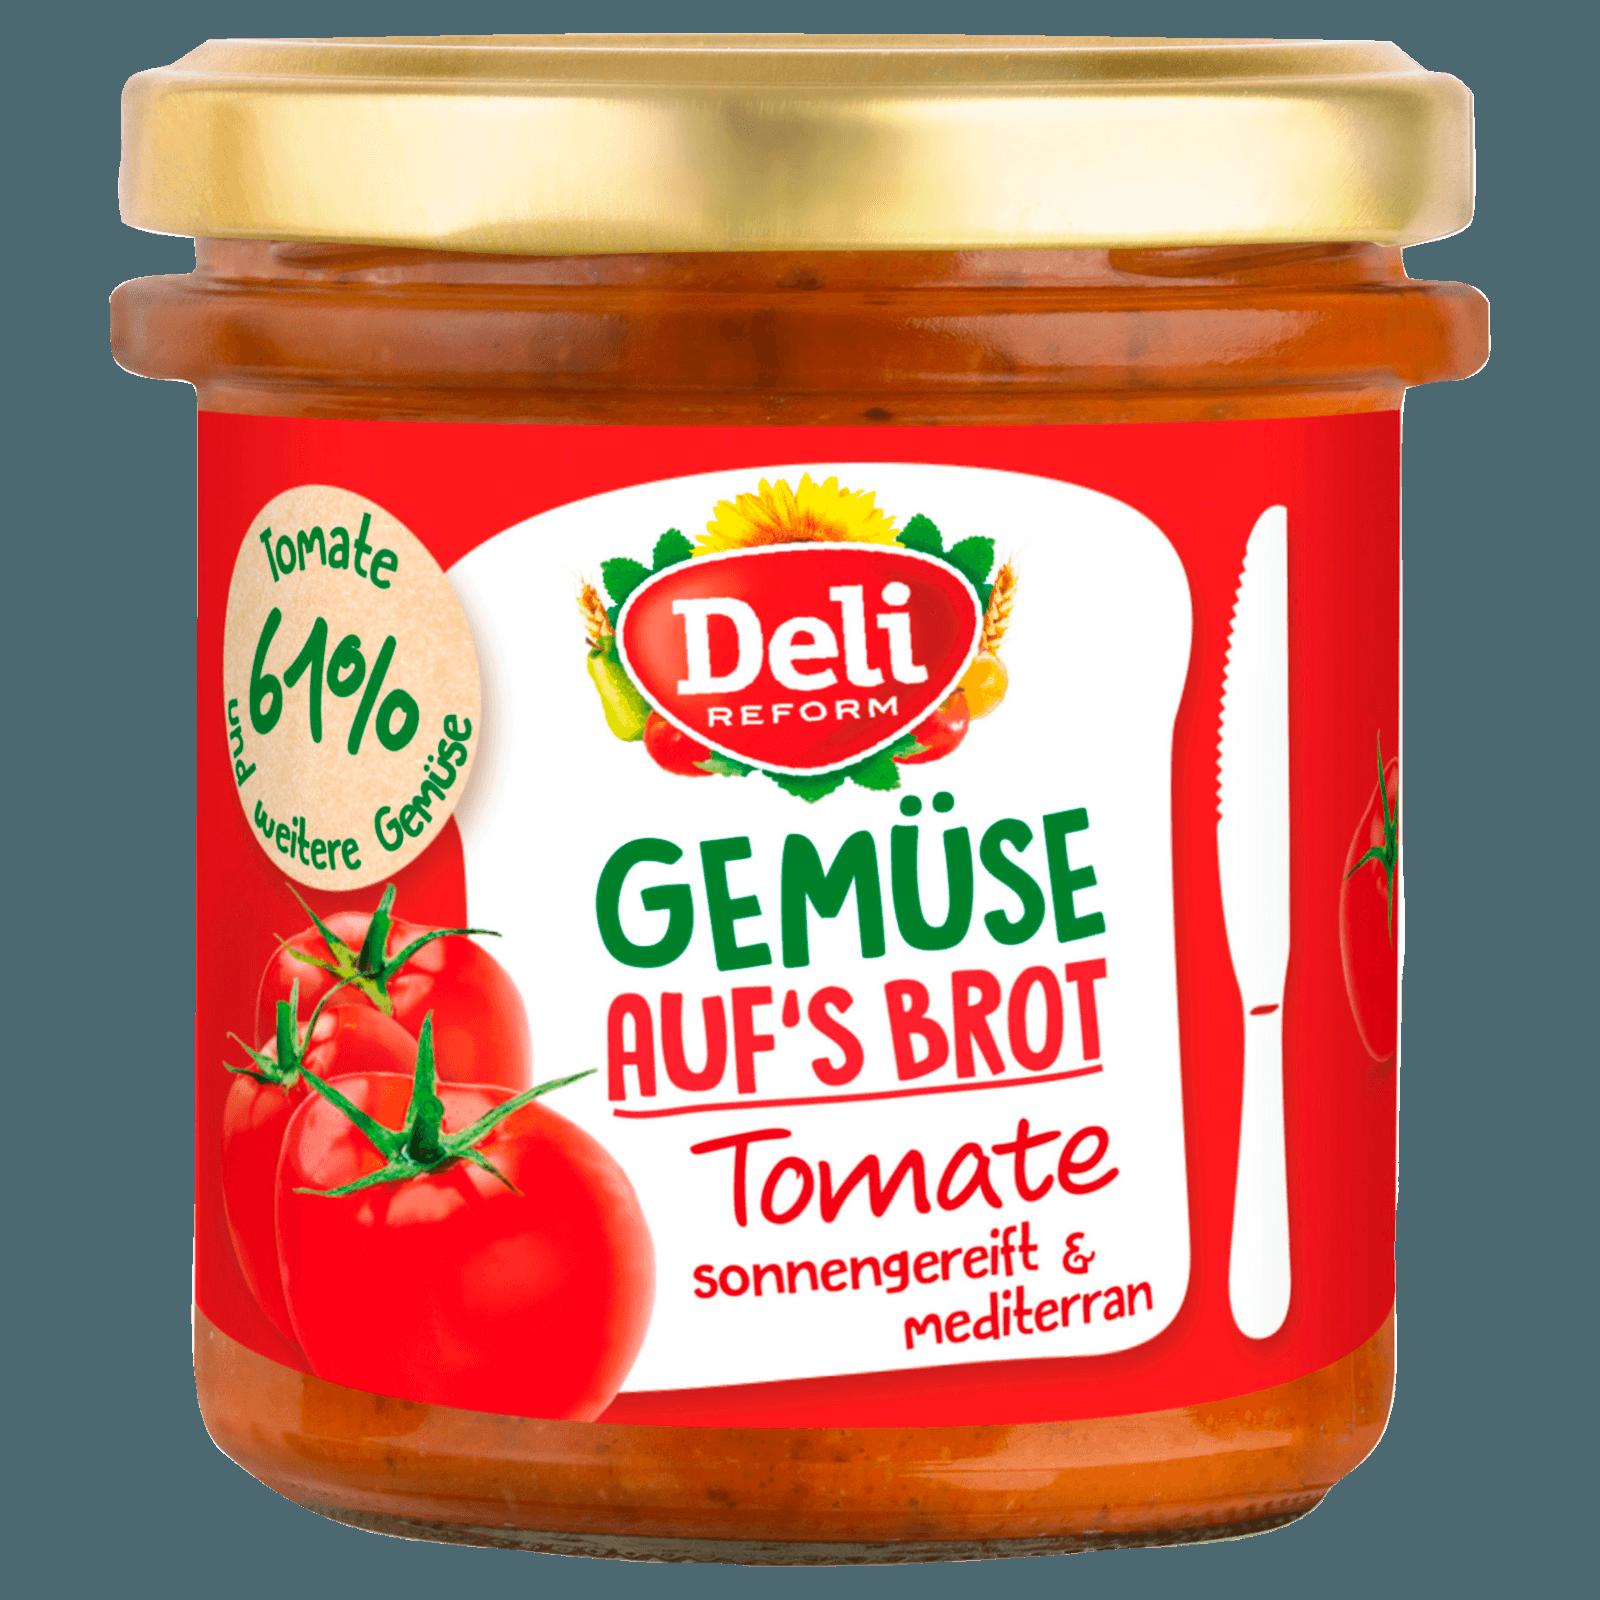 Deli Gemüse auf Brot Tomate 150g